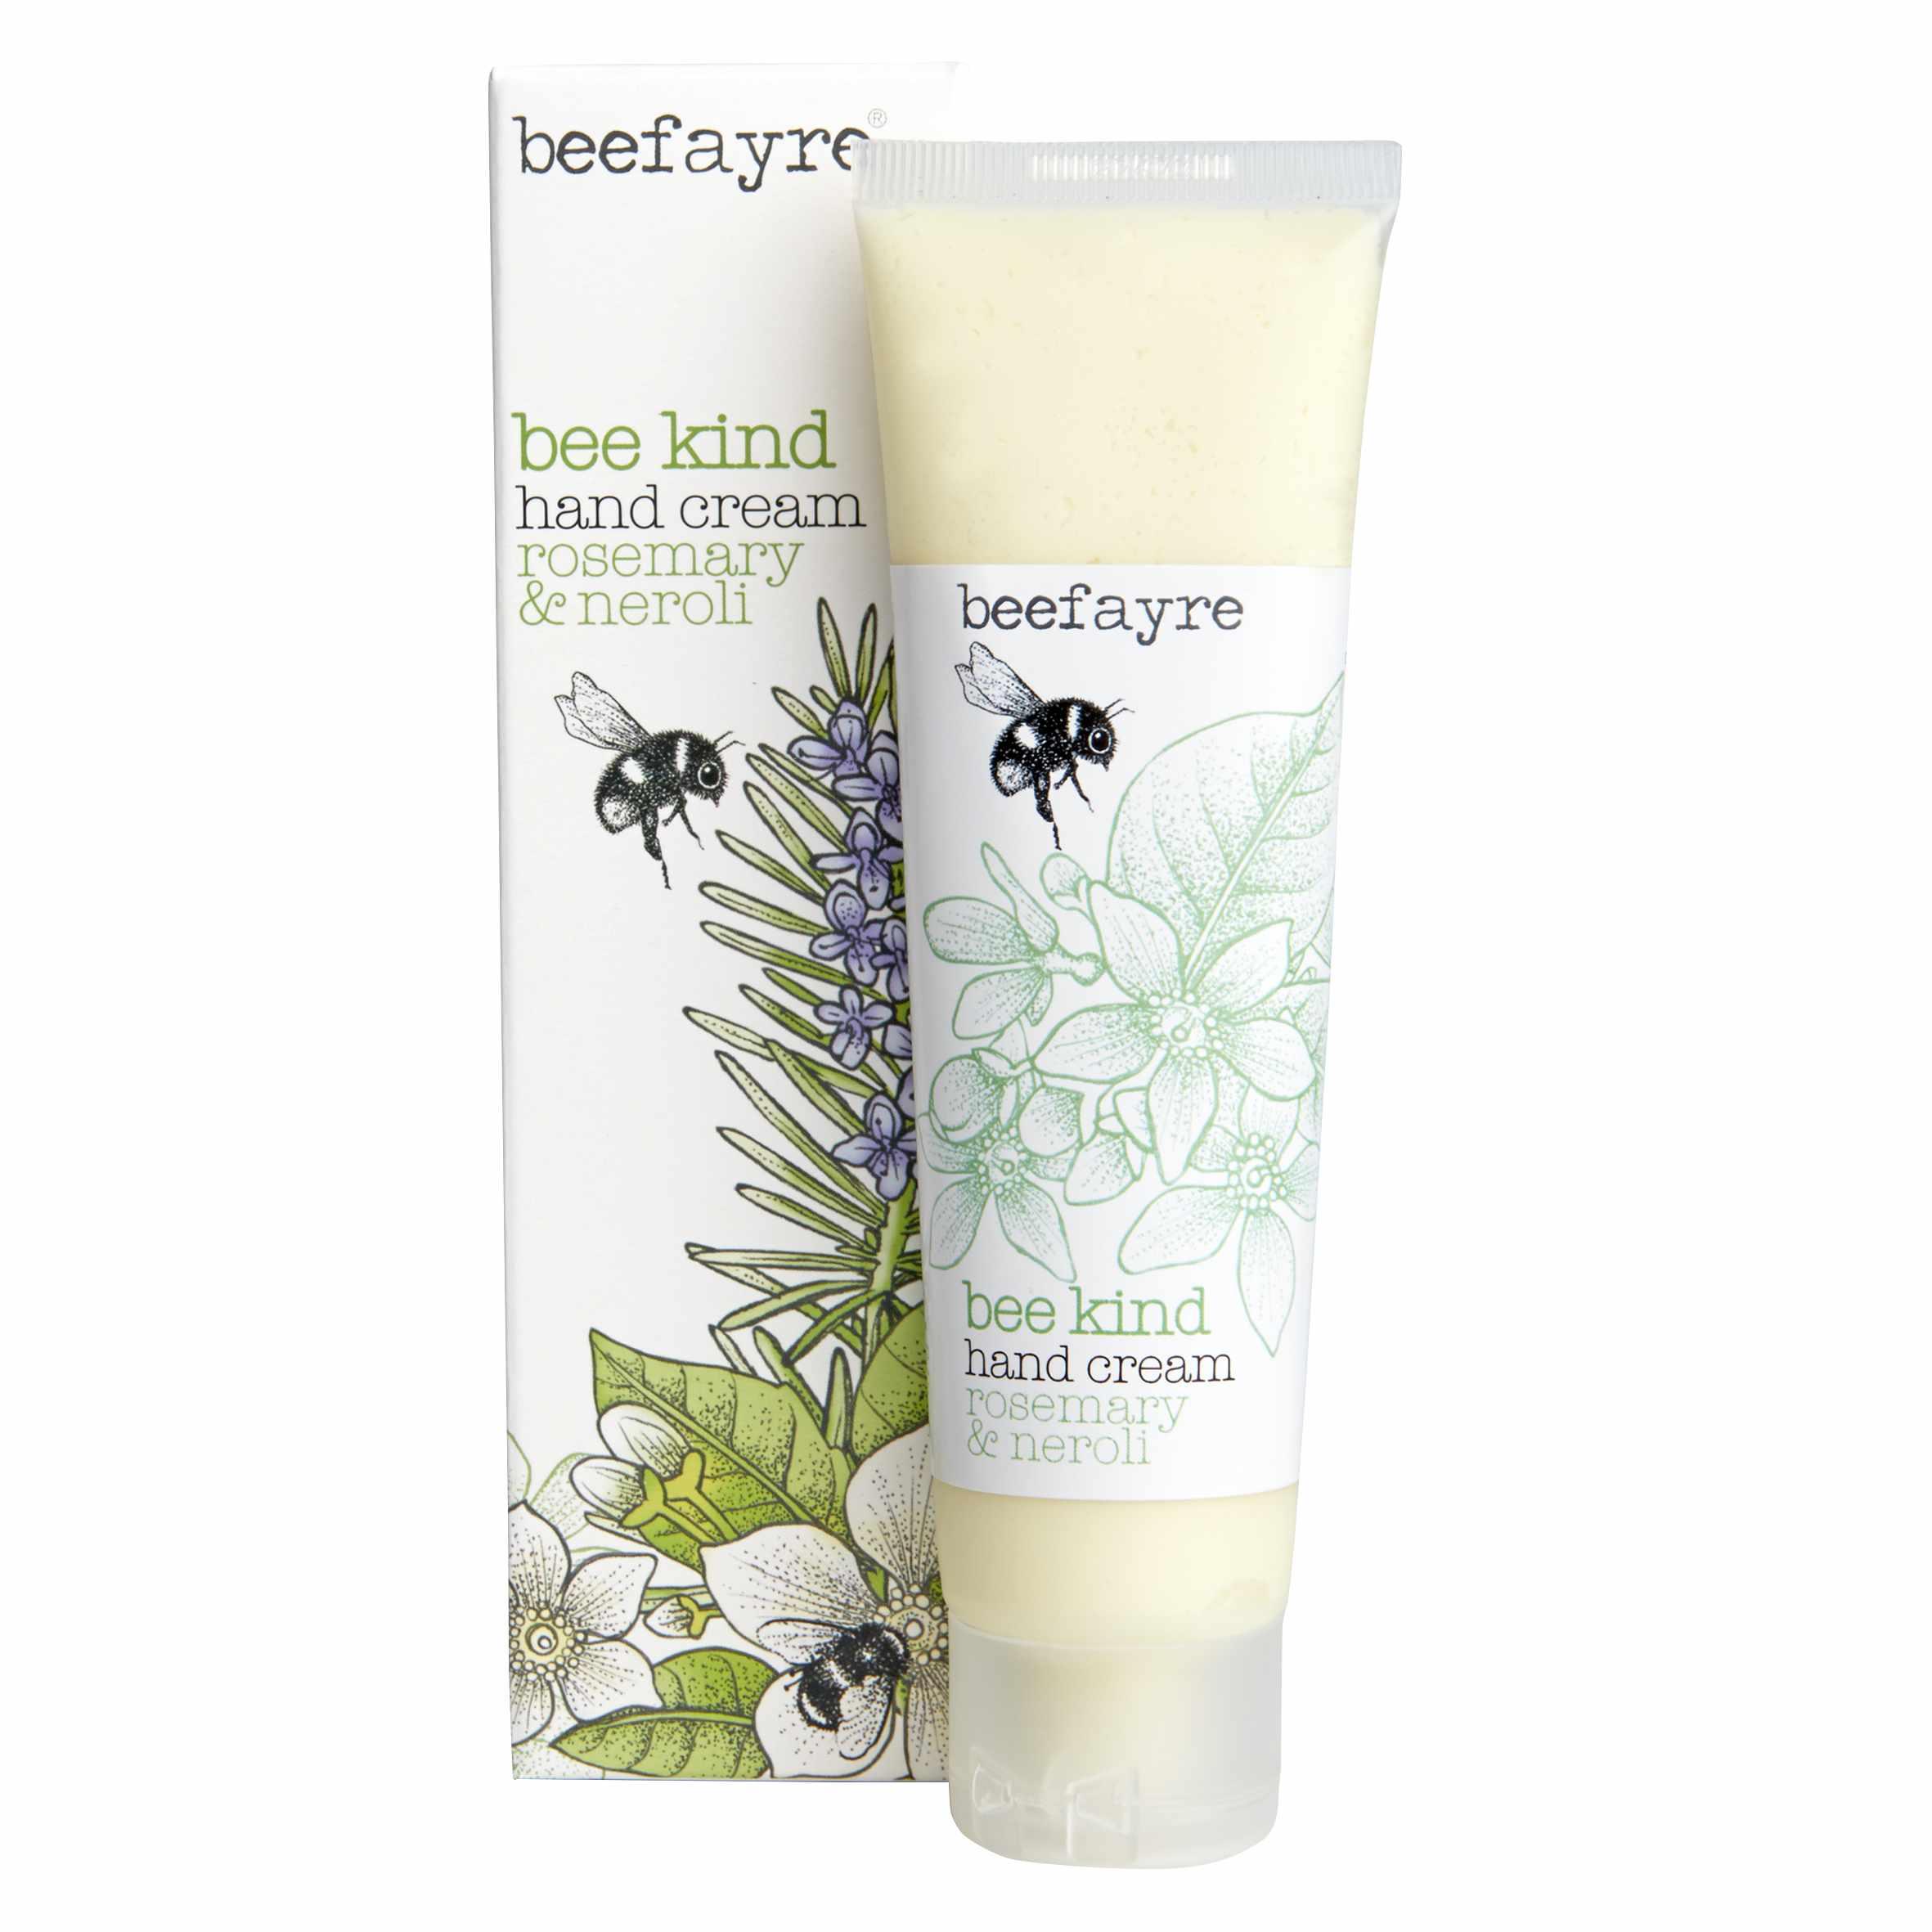 Bee Kind Hand Cream WBG.jpg